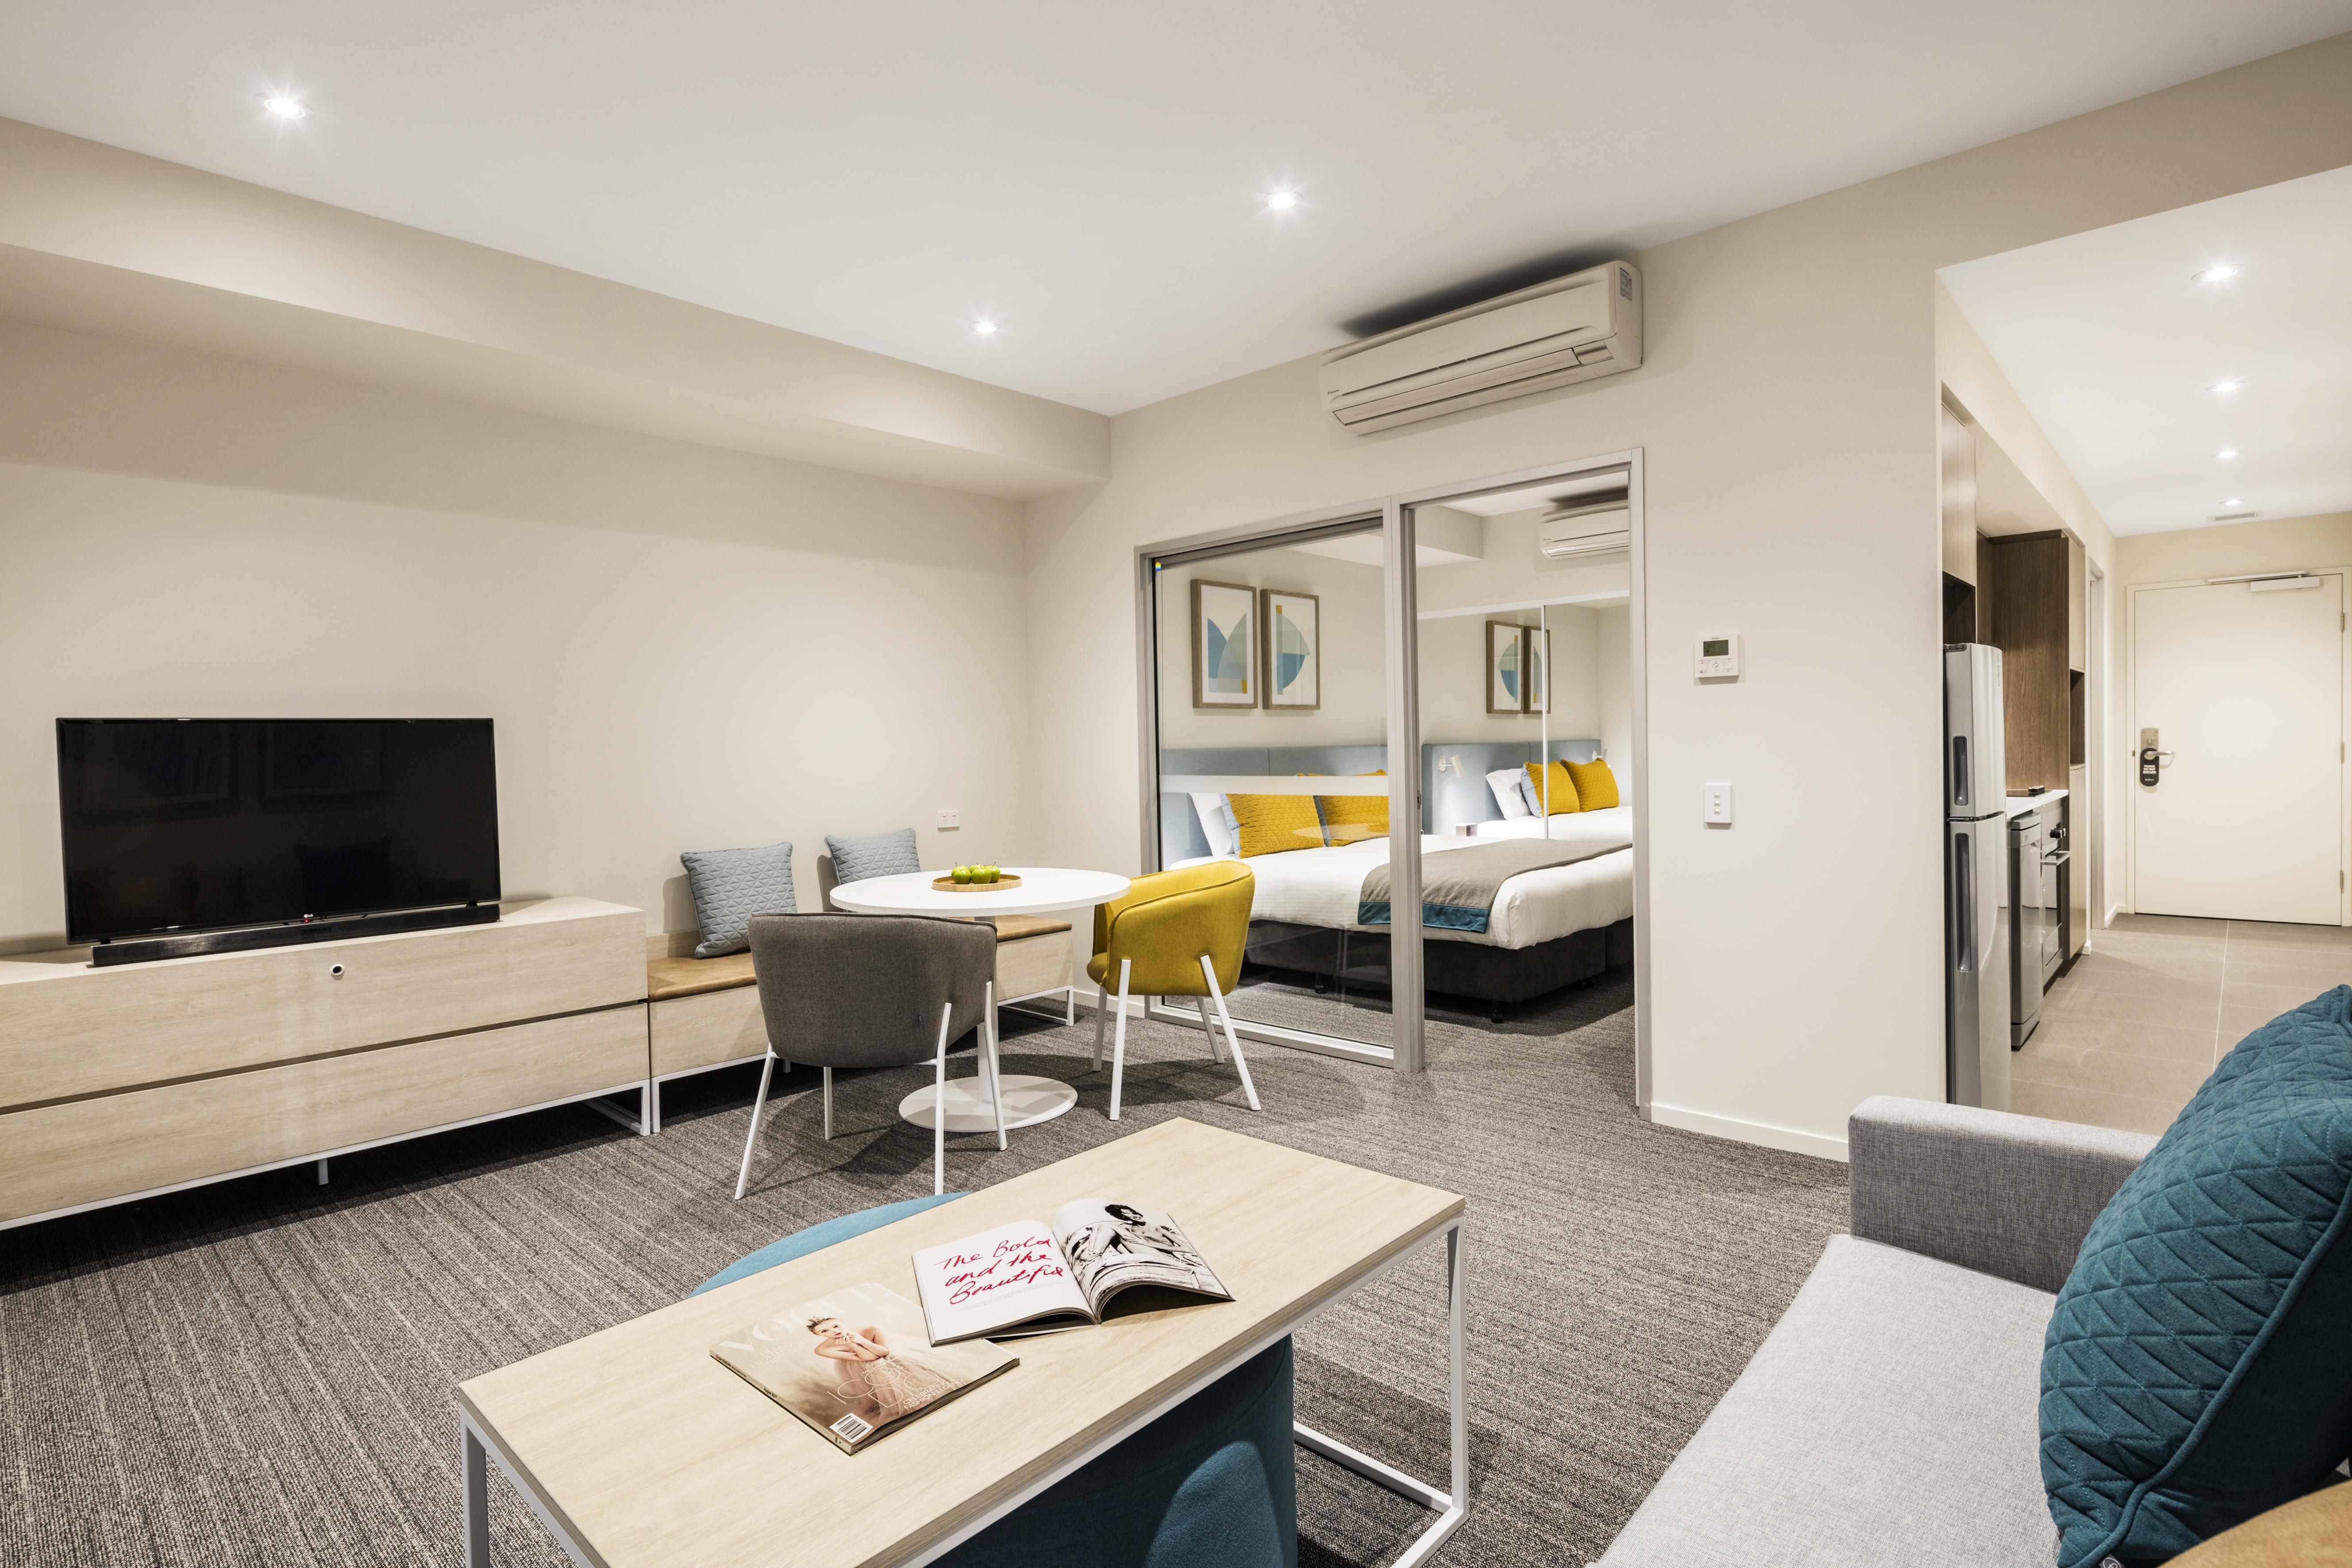 Quest_Liverpool_City_Centre_Apartment_interior_impression